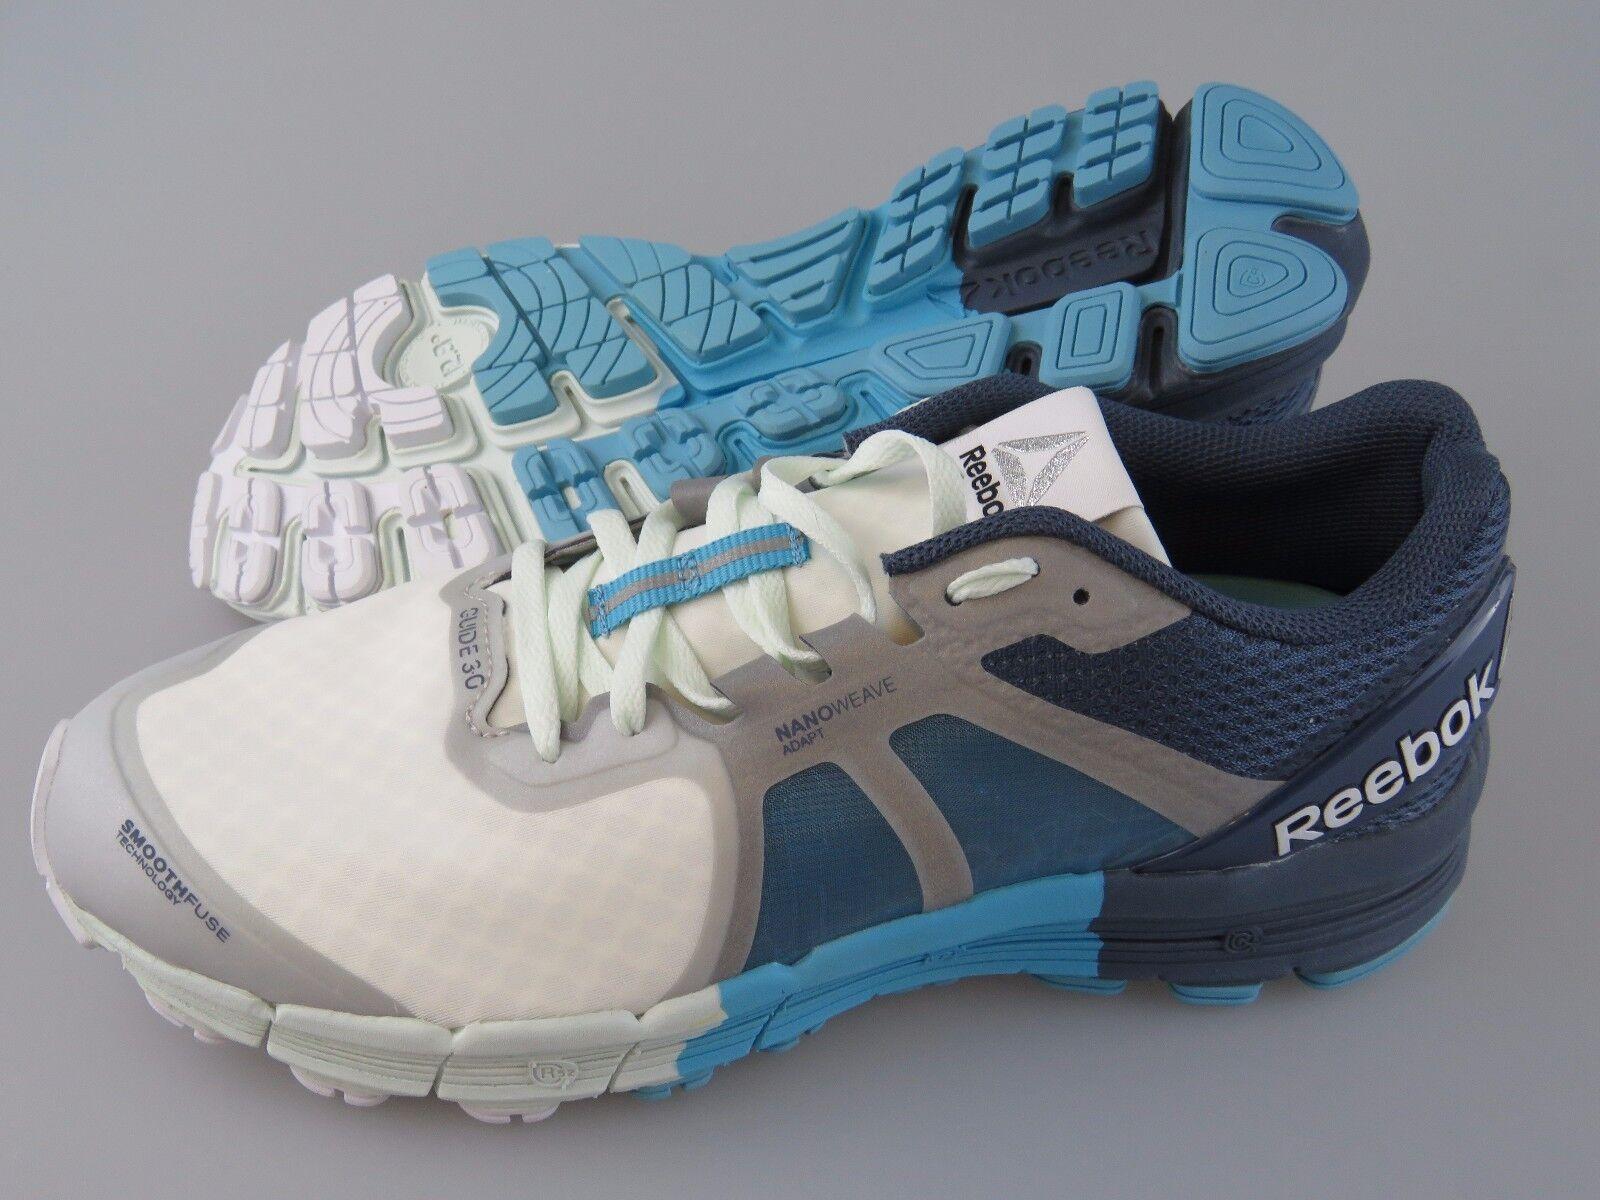 REEBOK One Guide 3.0 Opal Royal Slate Crisp bluee Athletic shoes Women's US 9.5